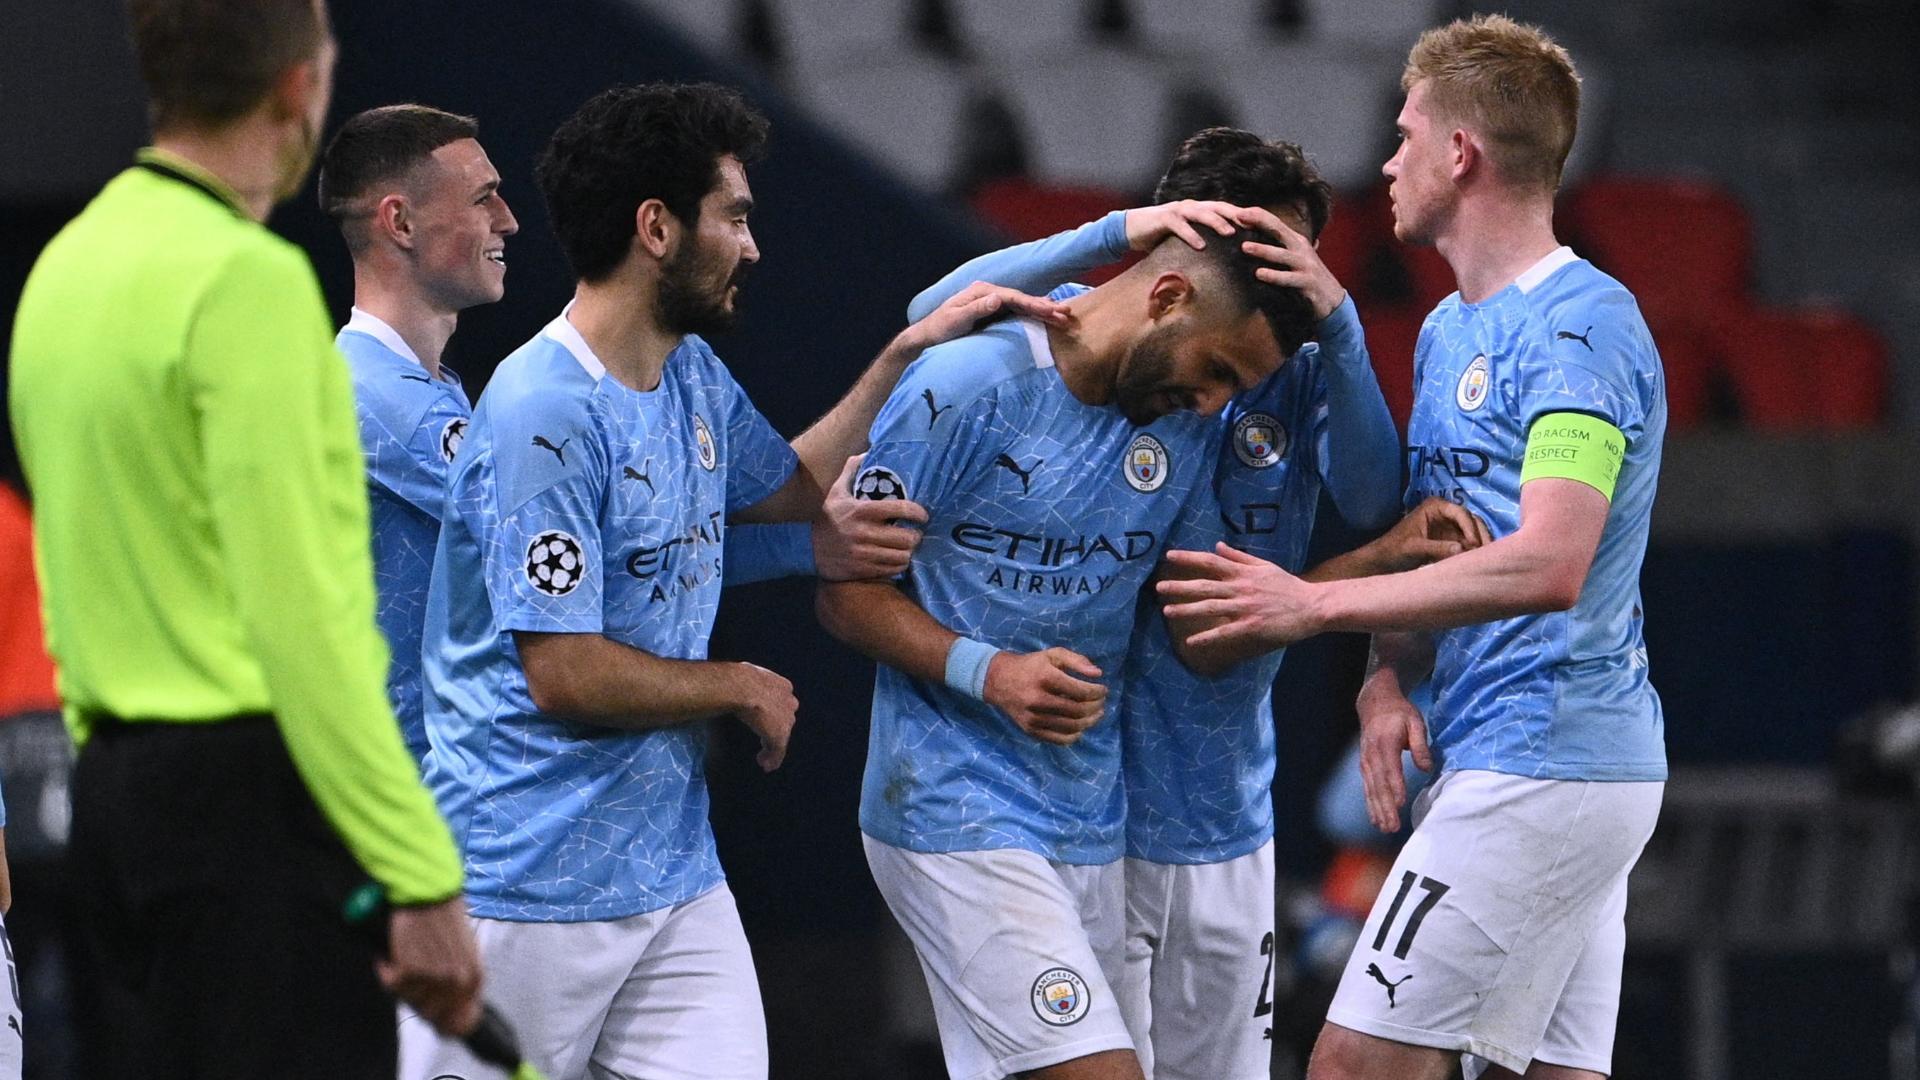 man city celebrate mahrez goal vs psg bfqg7ekt1fp613zvgts5brldc